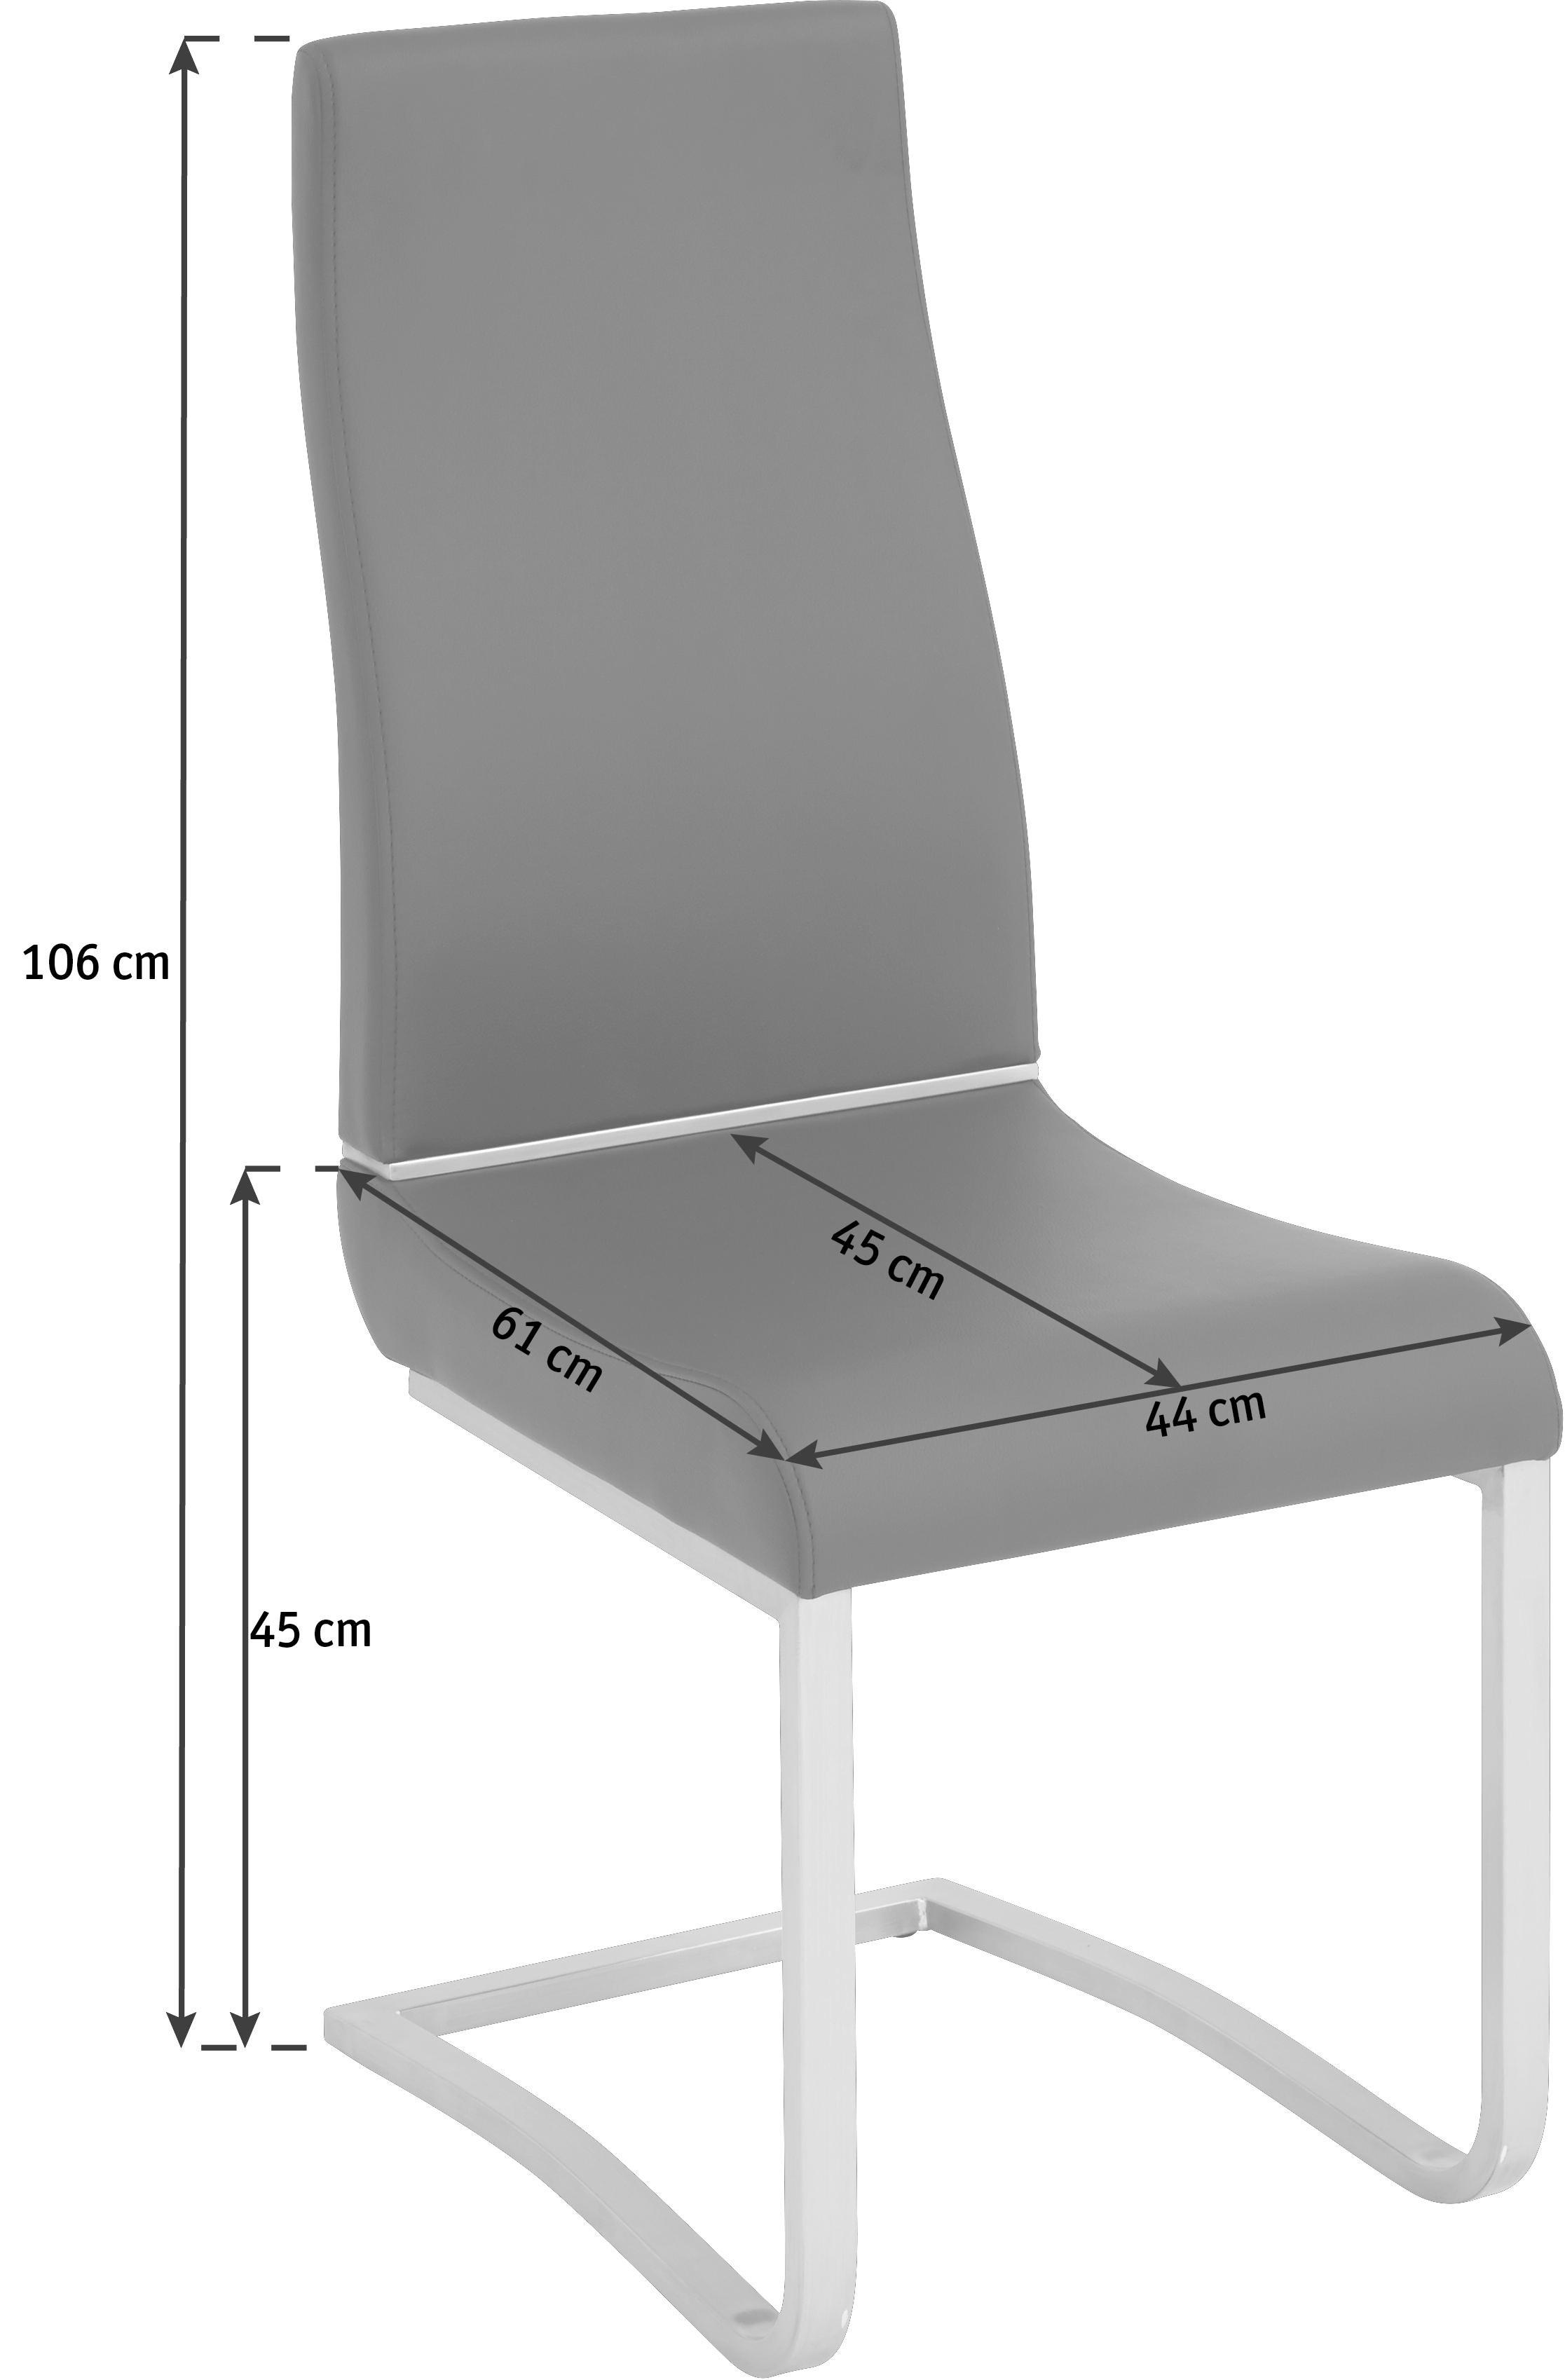 SCHWINGSTUHL in Metall, Textil Edelstahlfarben, Weiß - Edelstahlfarben/Weiß, MODERN, Textil/Metall (44/106/61cm) - NOVEL